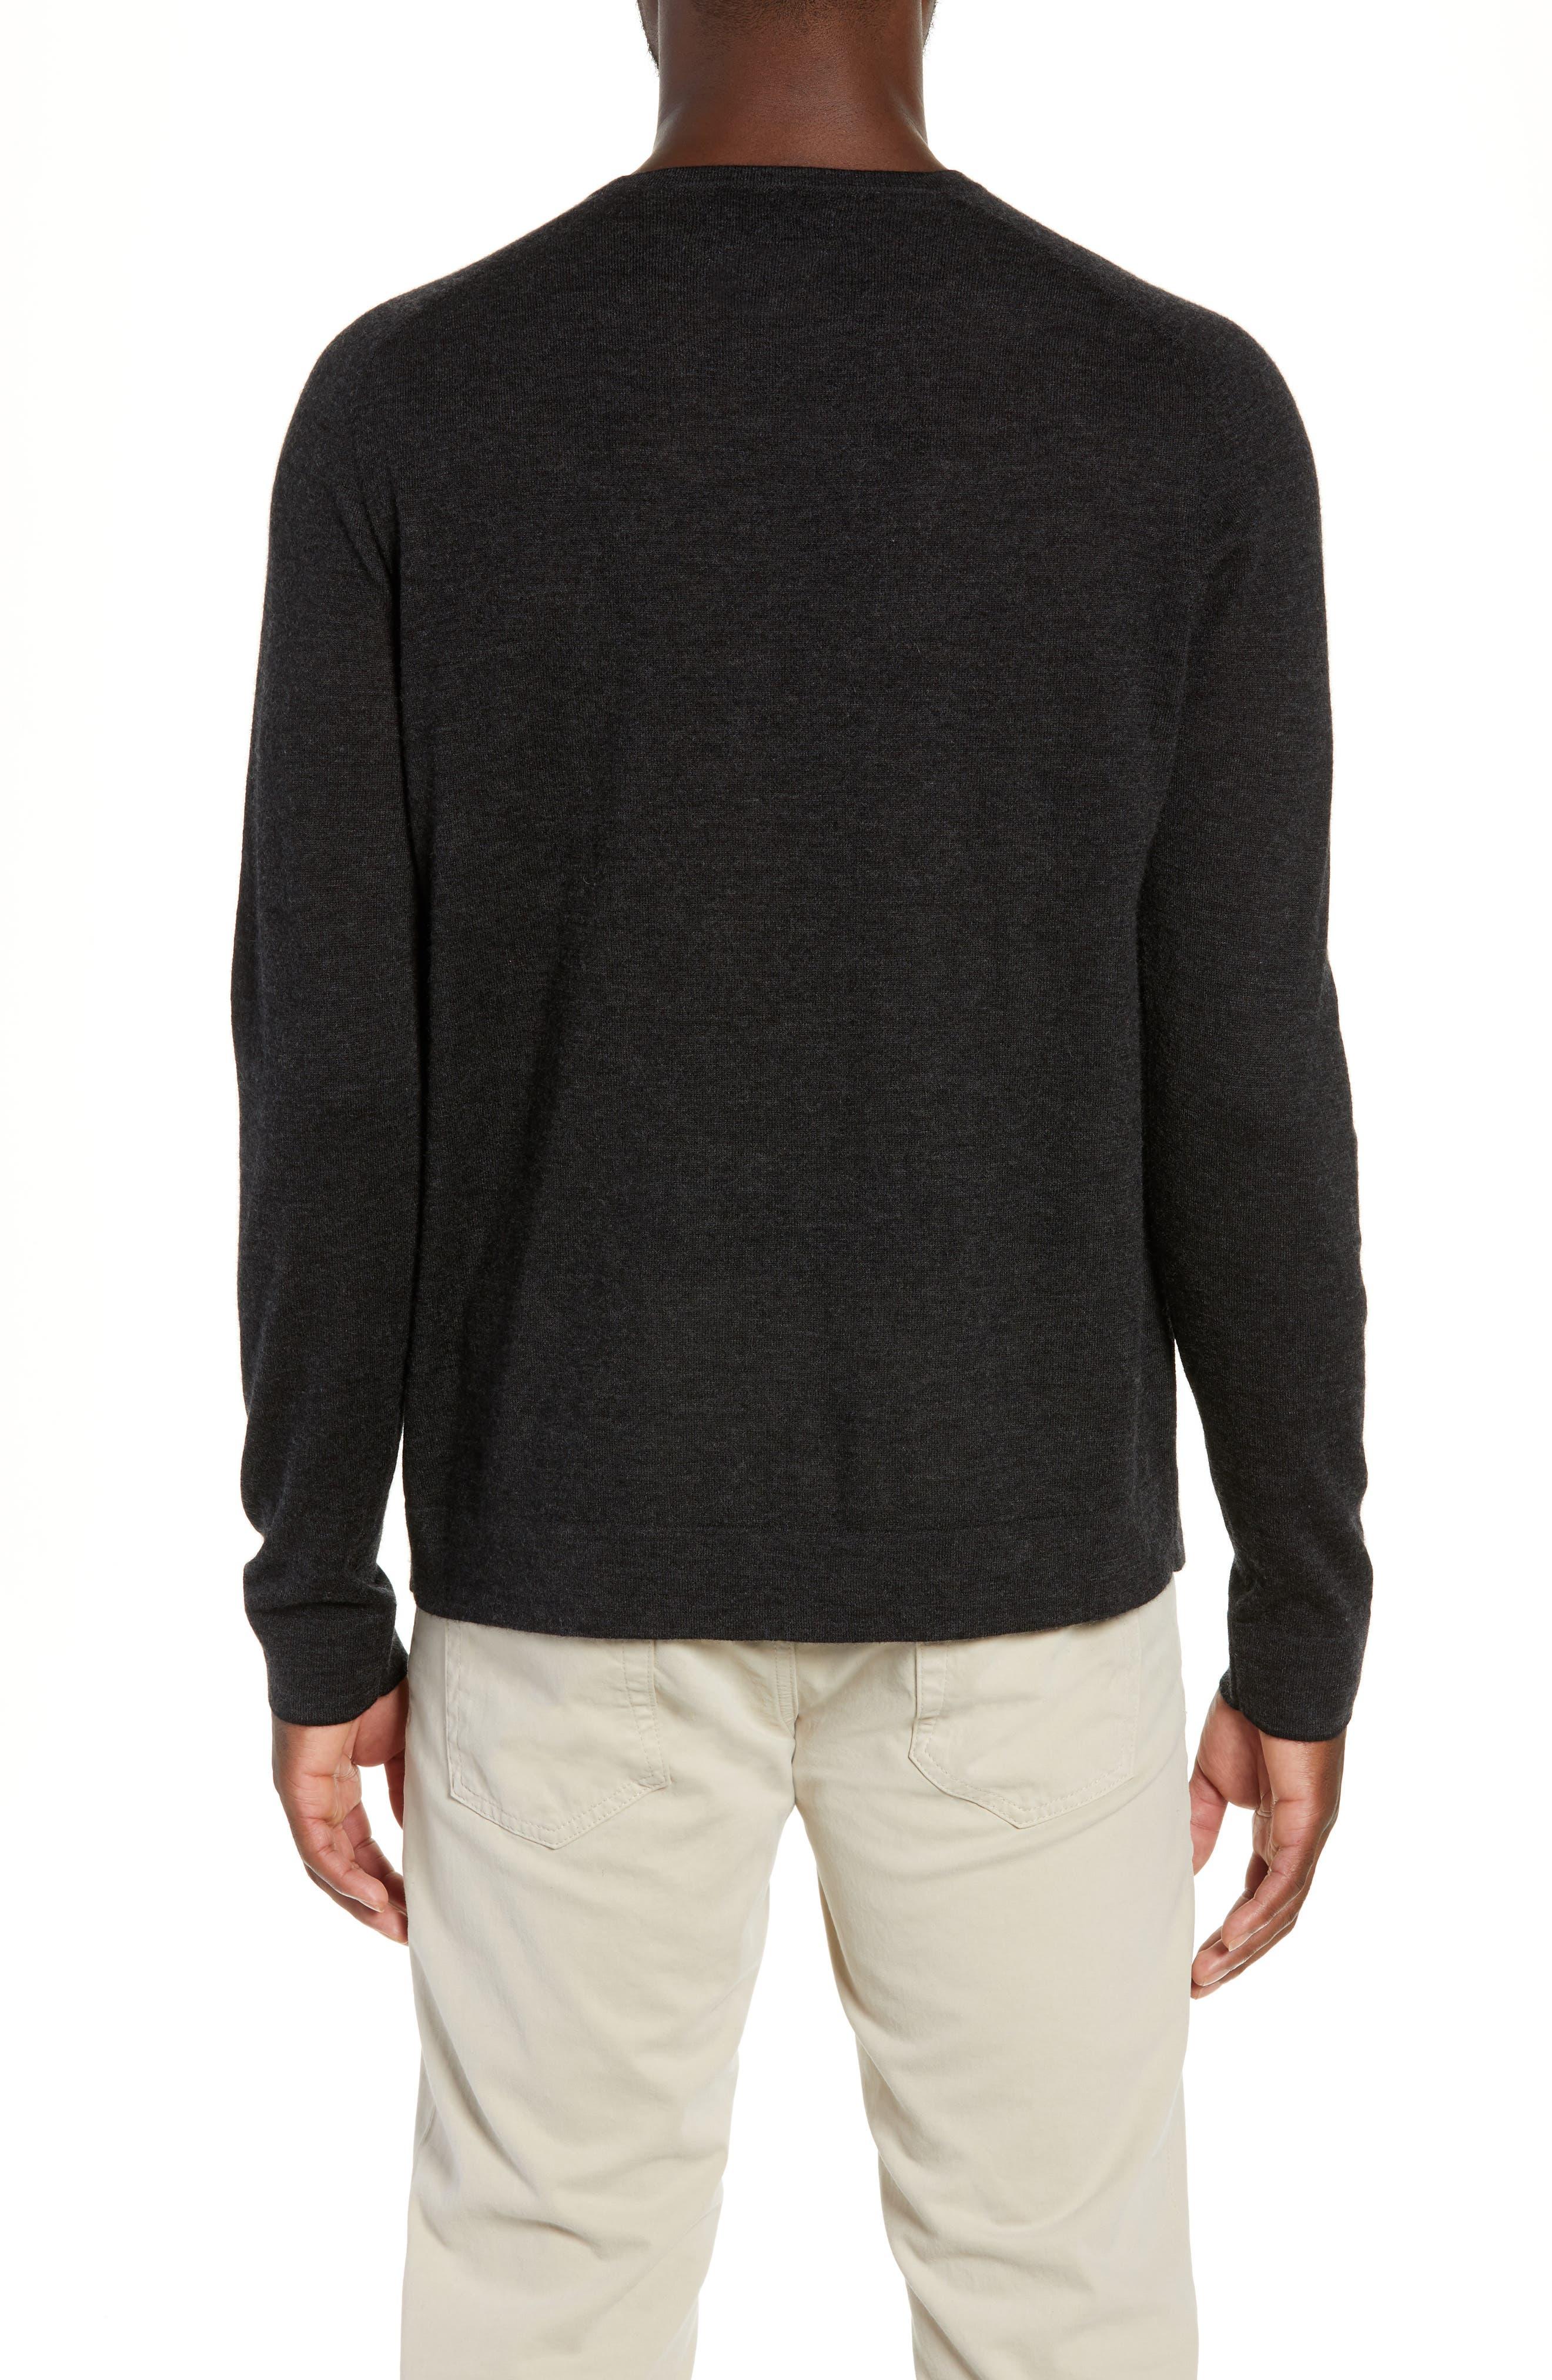 NORDSTROM SIGNATURE,                             Cashmere Crewneck Sweater,                             Alternate thumbnail 2, color,                             030